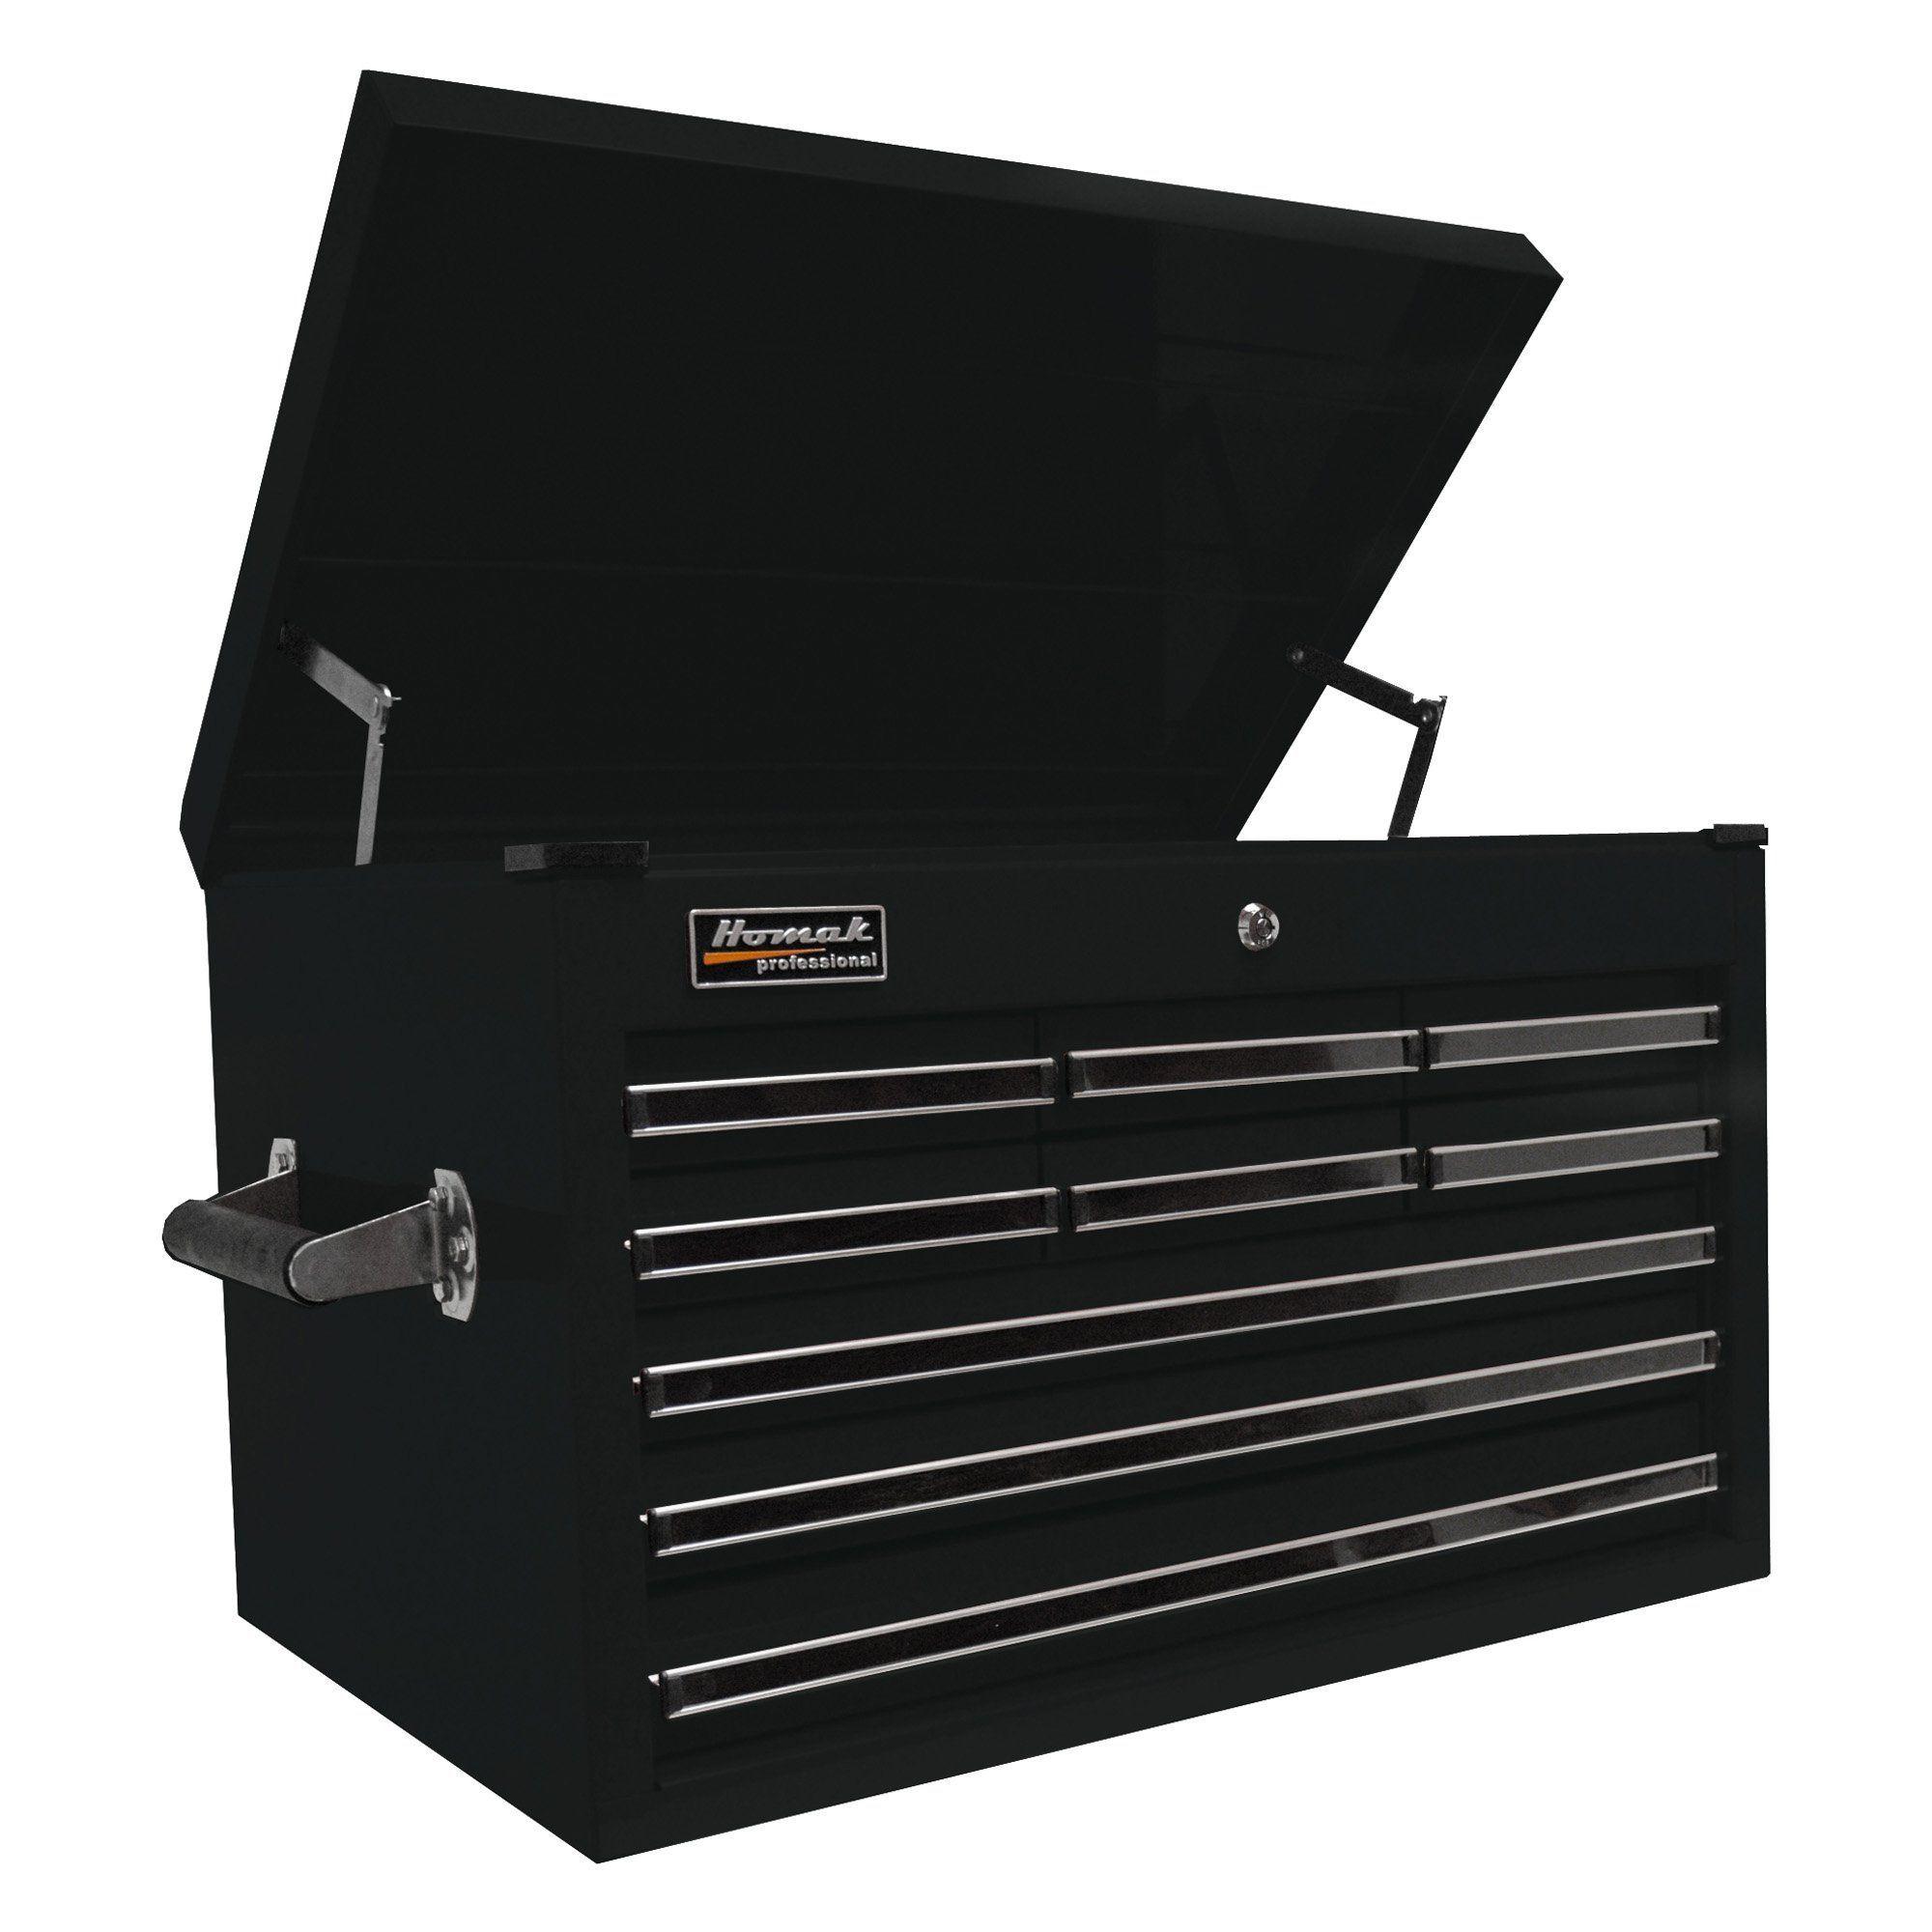 Homak Pro Series 9 Drawer Extended Top Chest - BK02027901